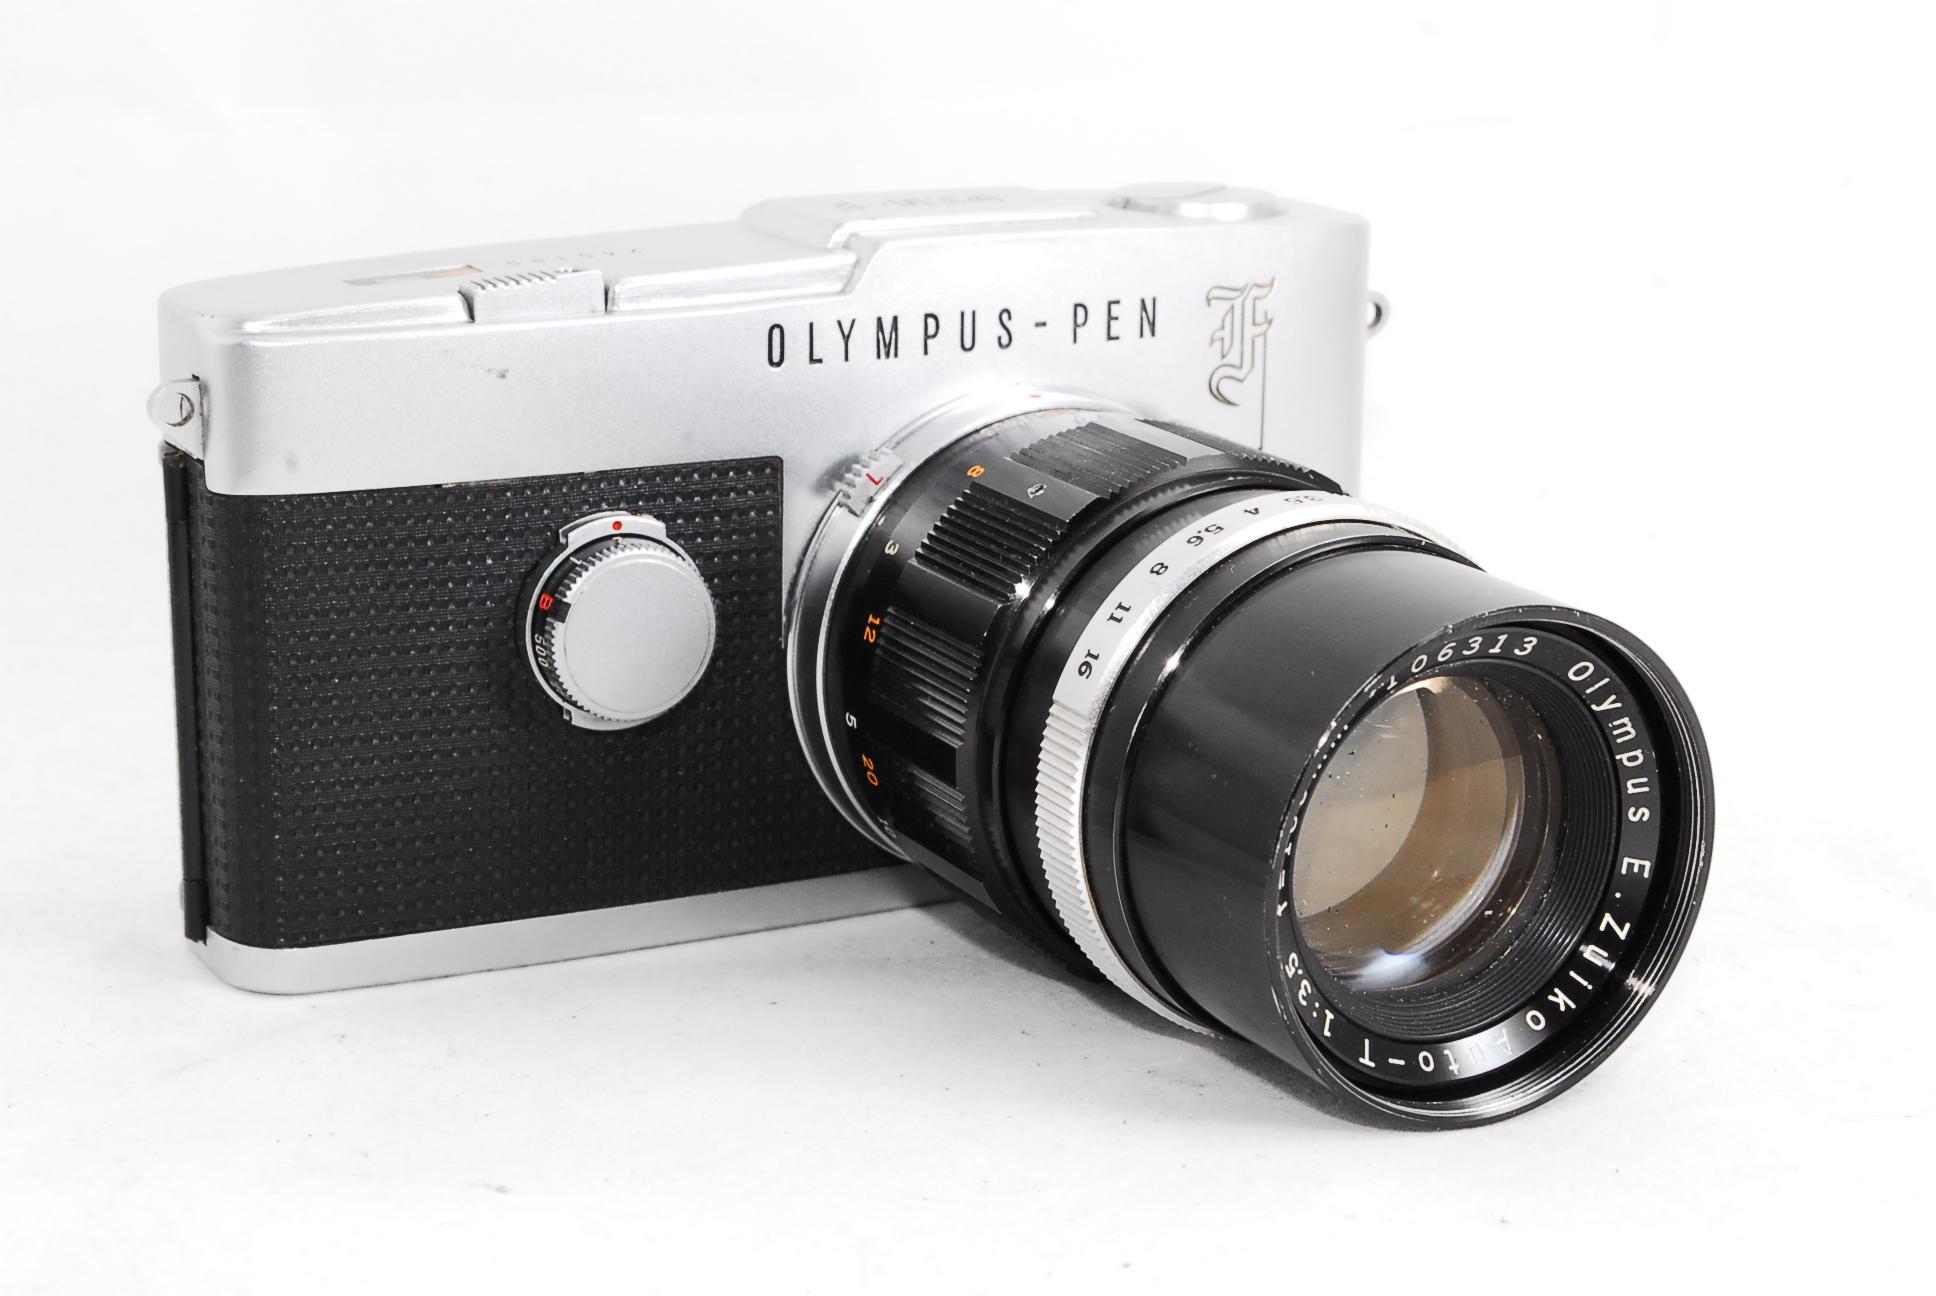 Olympus Pen F 100mm F3.5 Lens